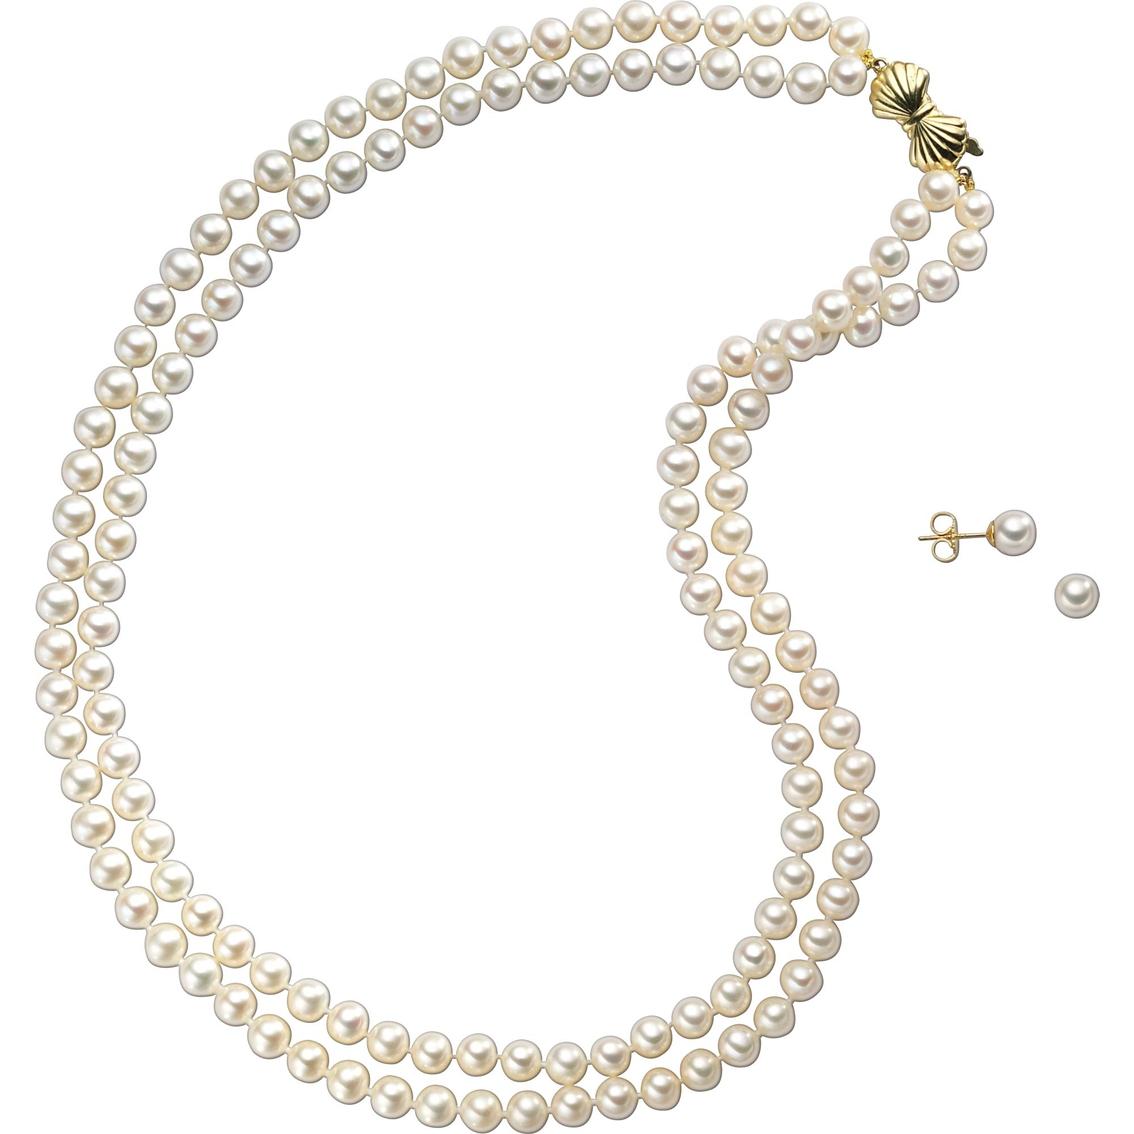 Mikimoto Pearls Necklace: Blue Lagoon By Mikimoto 14k Yellow Gold Freshwater